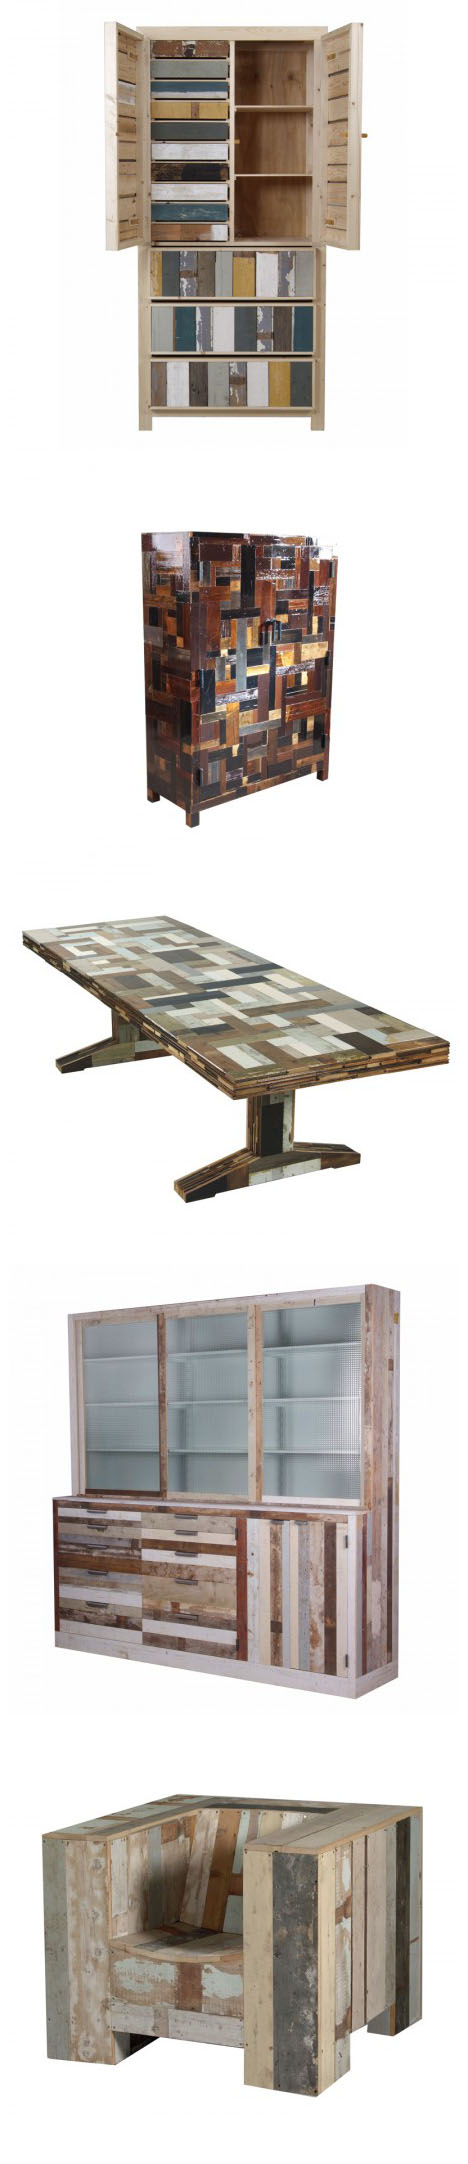 Piet Hein Eek s Raw Material for Furniture Scrap Wood